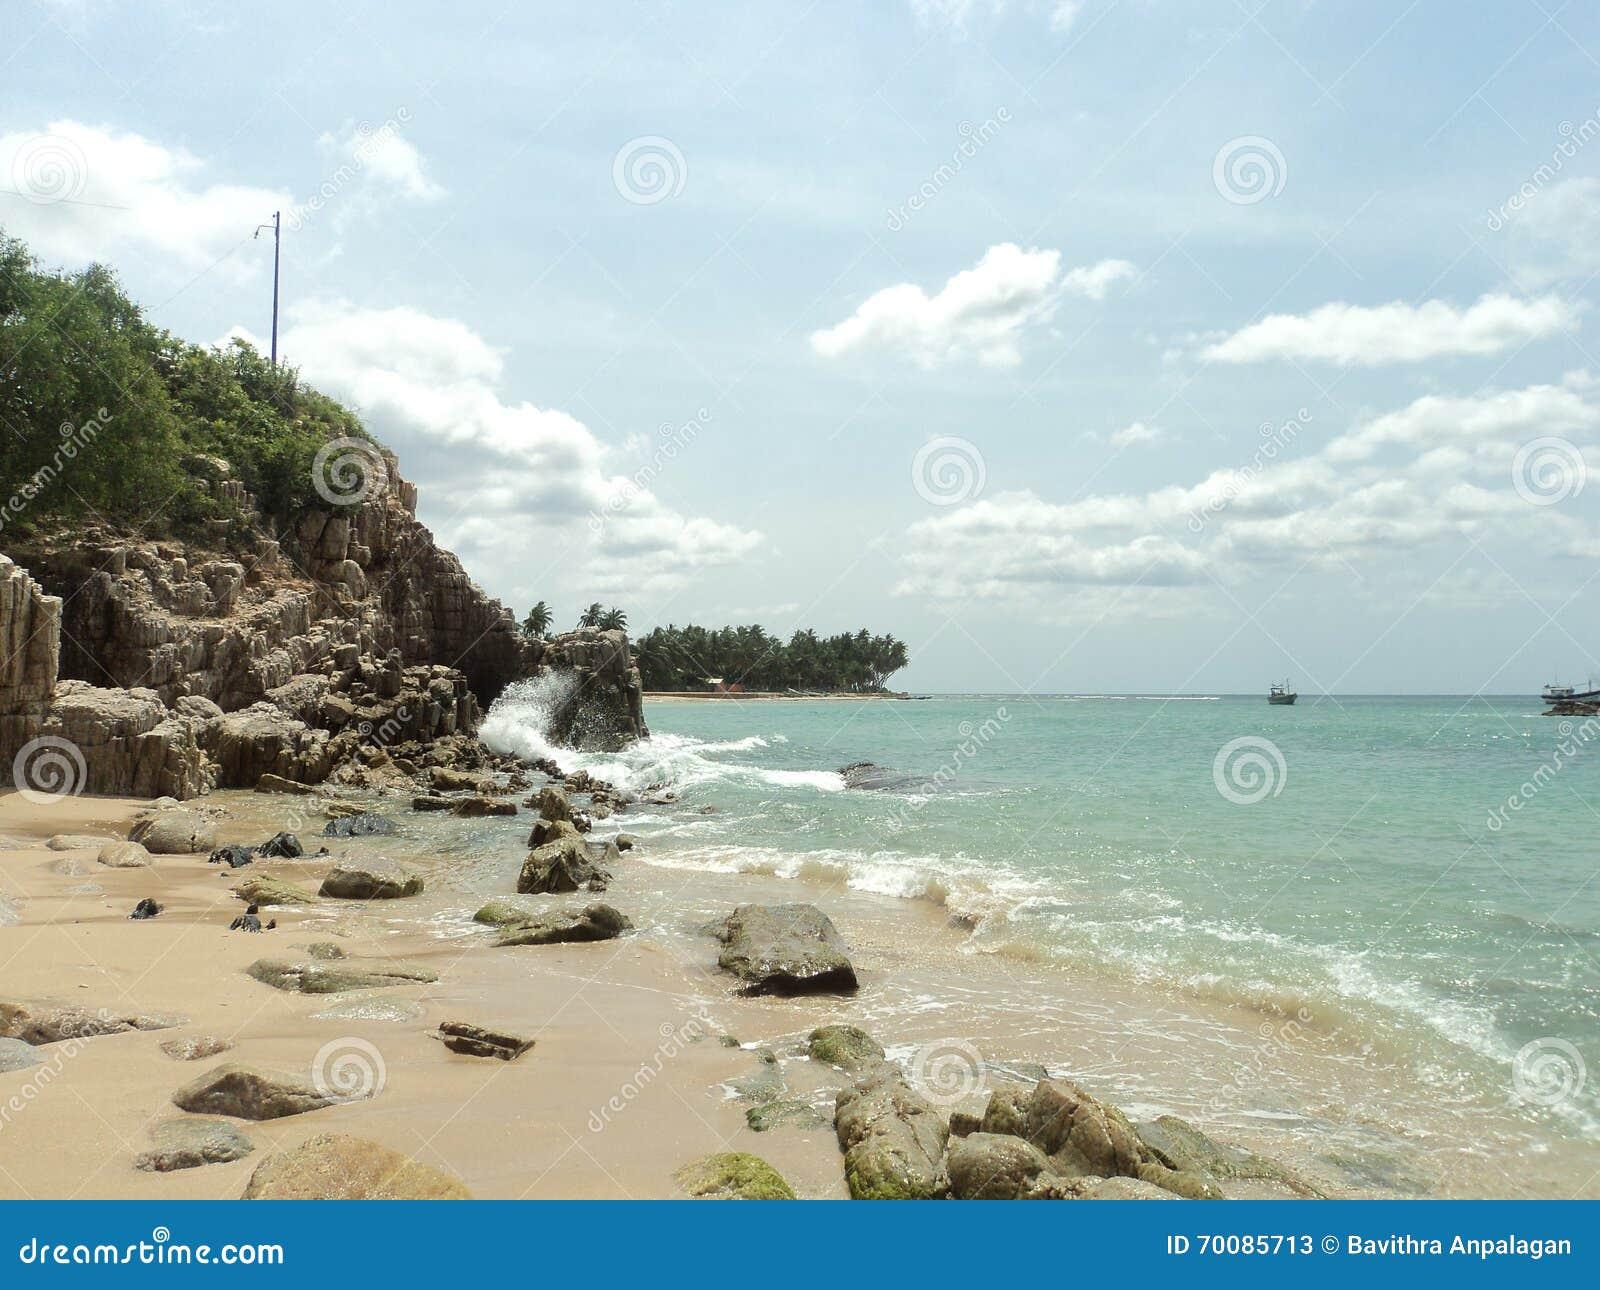 Waves breaking on giant rocks